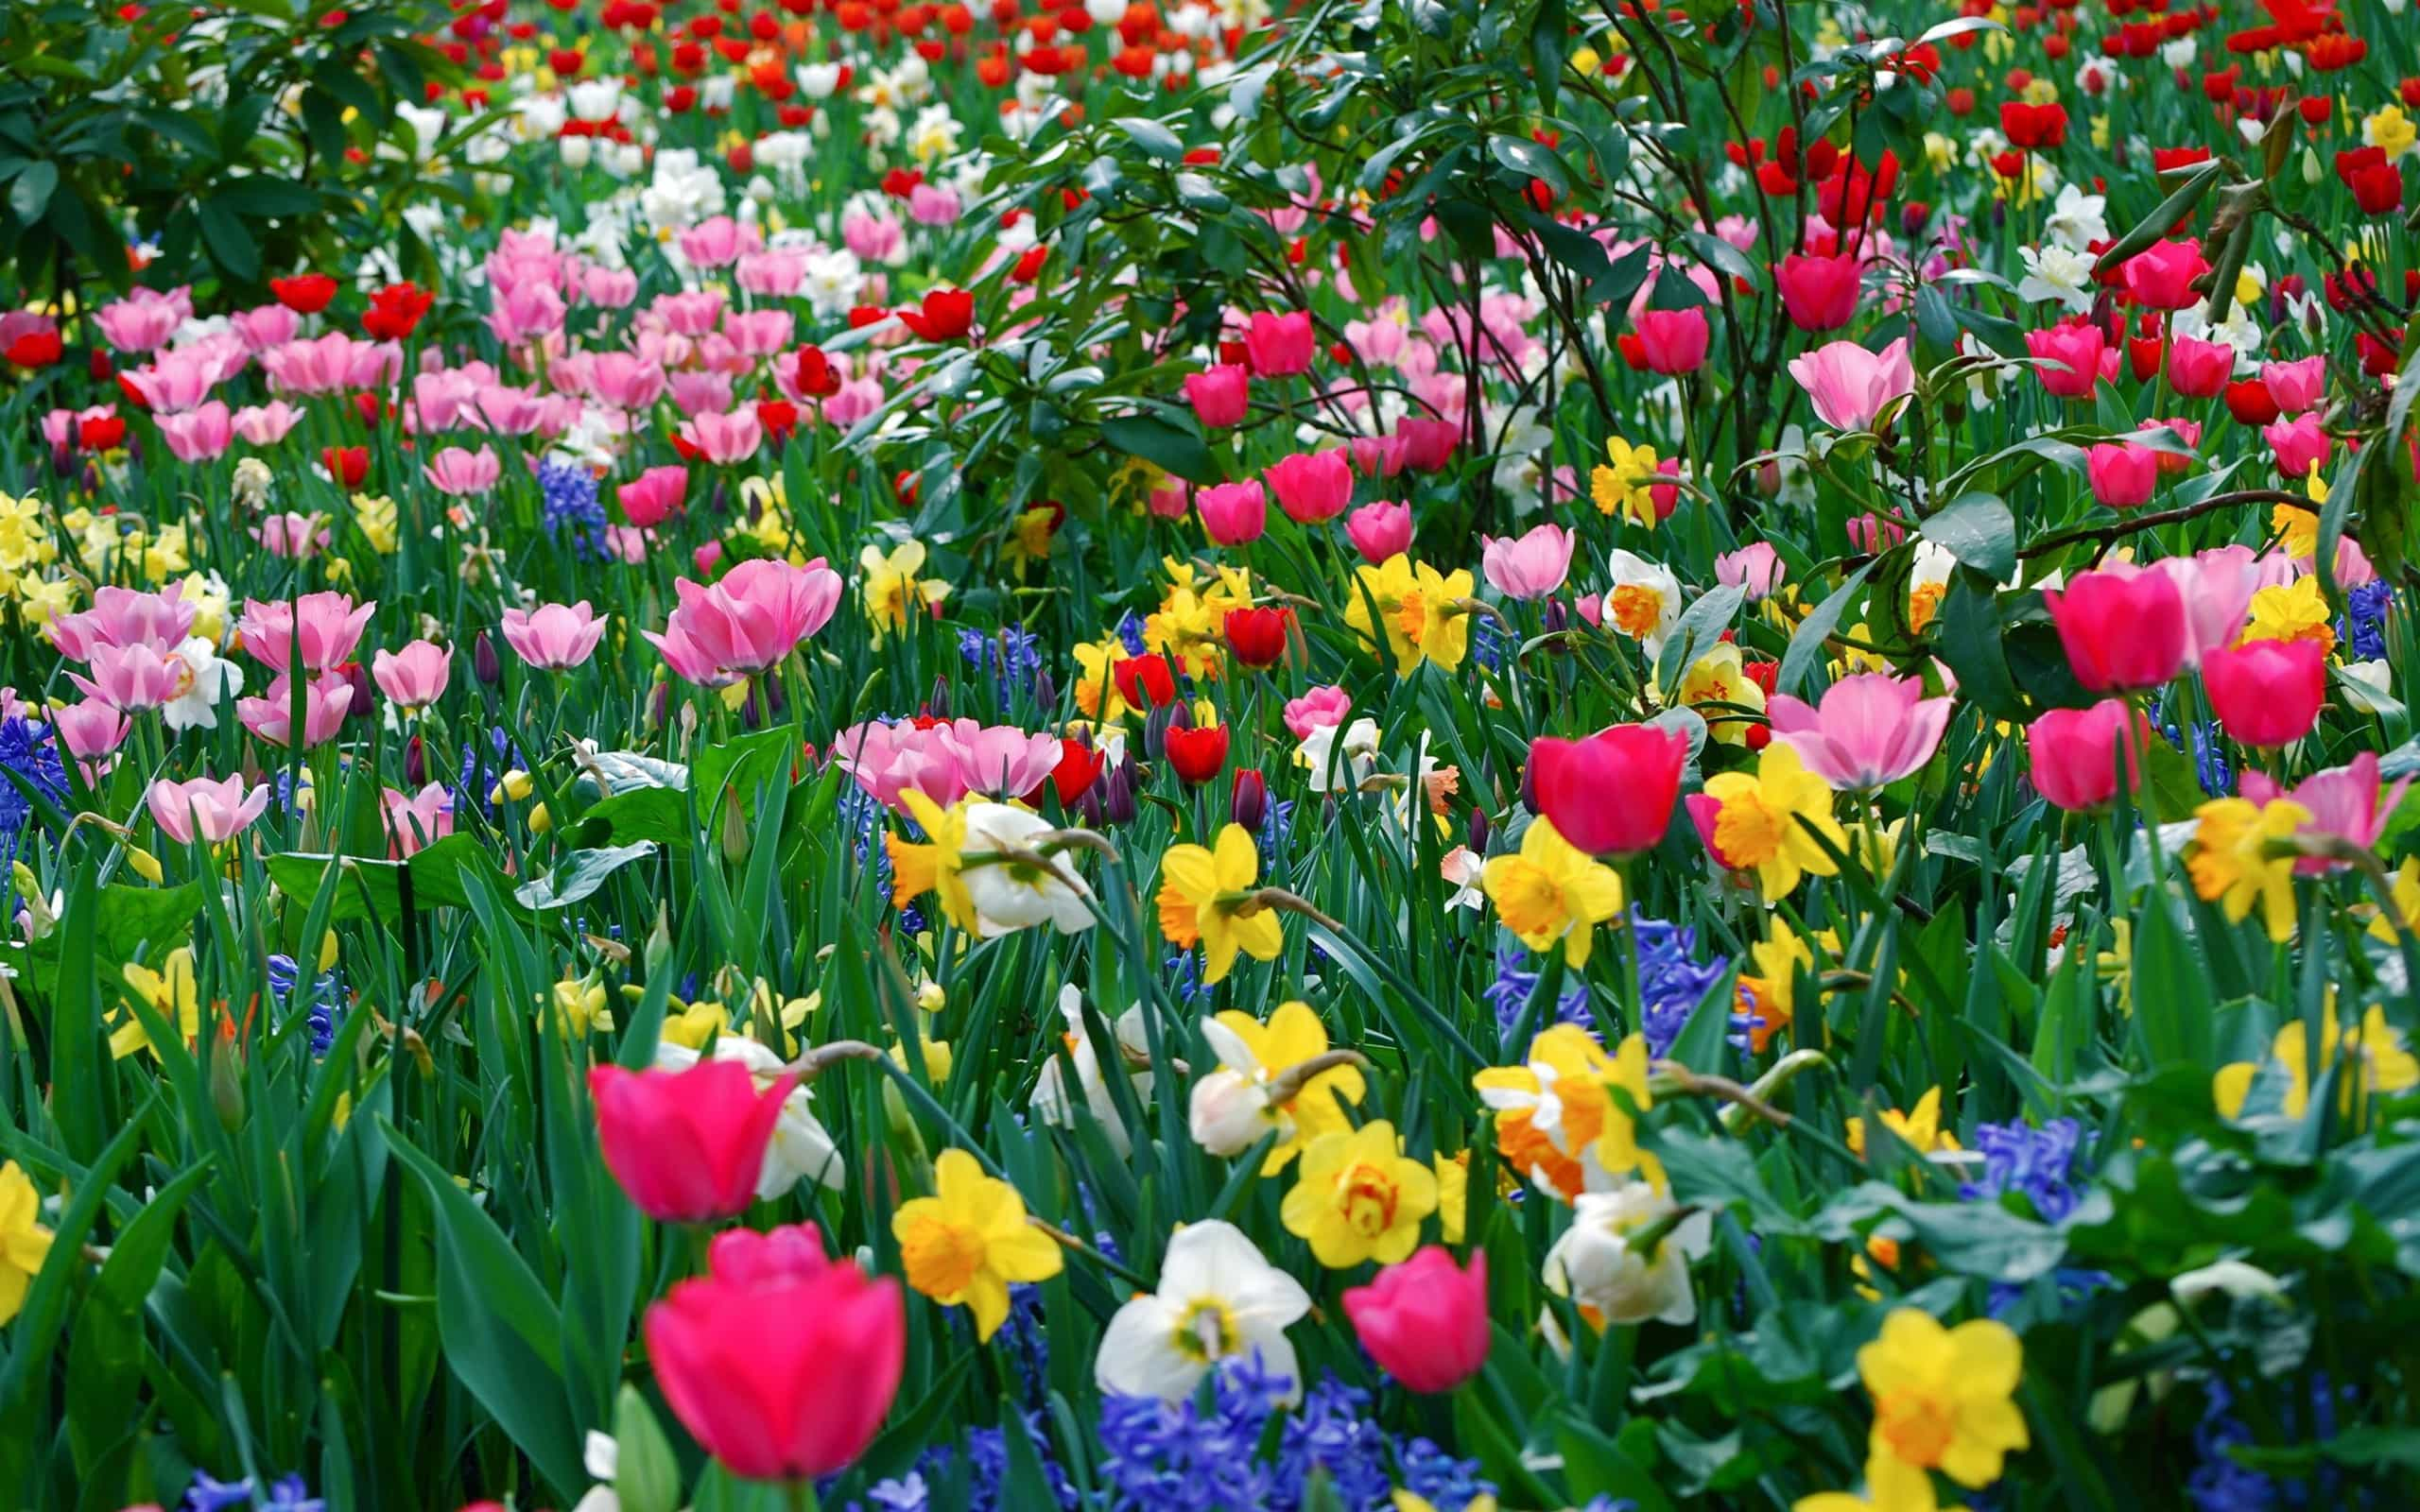 immagini belle di fiori 47 foto sfondi hd